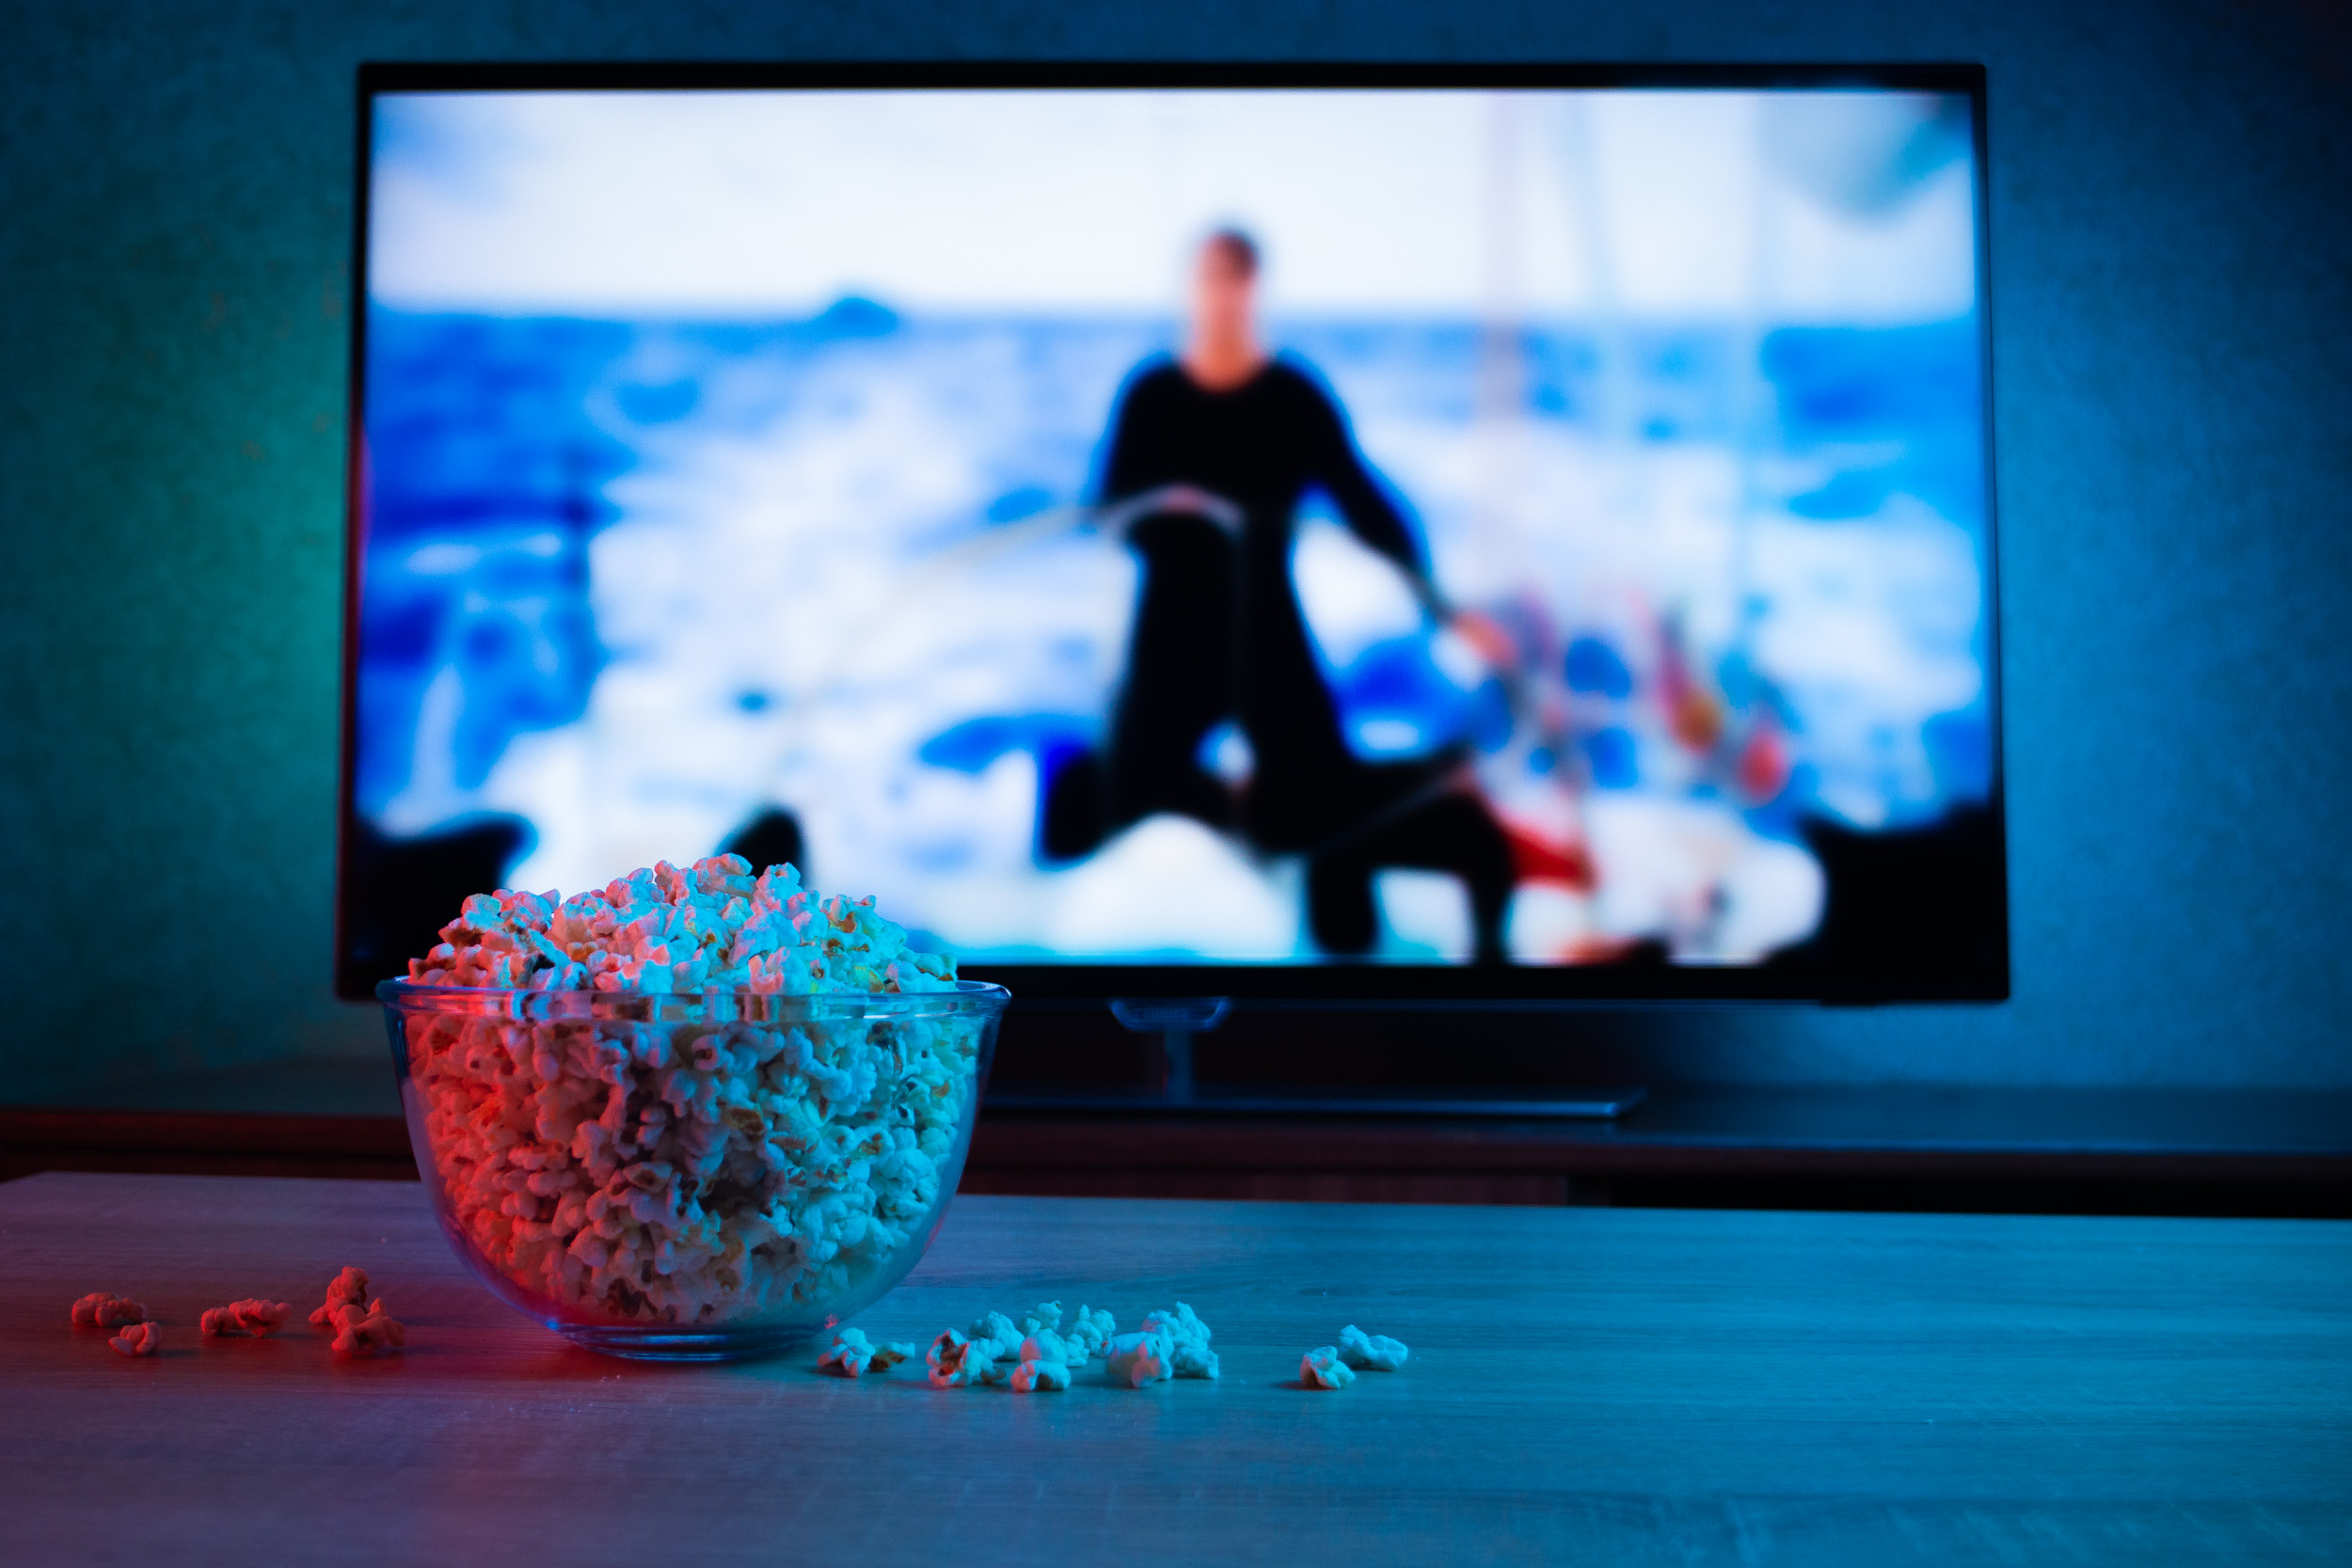 TV with popcorn